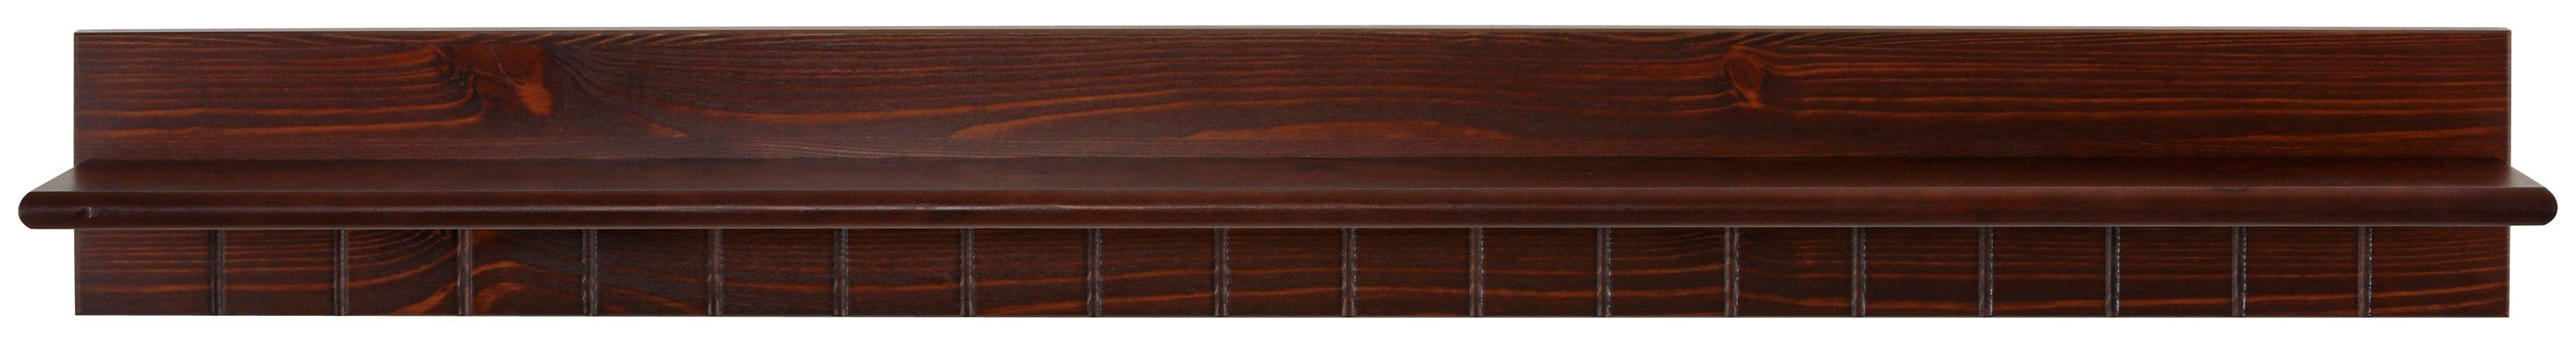 Home affaire Wandboard  Pöhl , 120 cm breit Preisvergleich